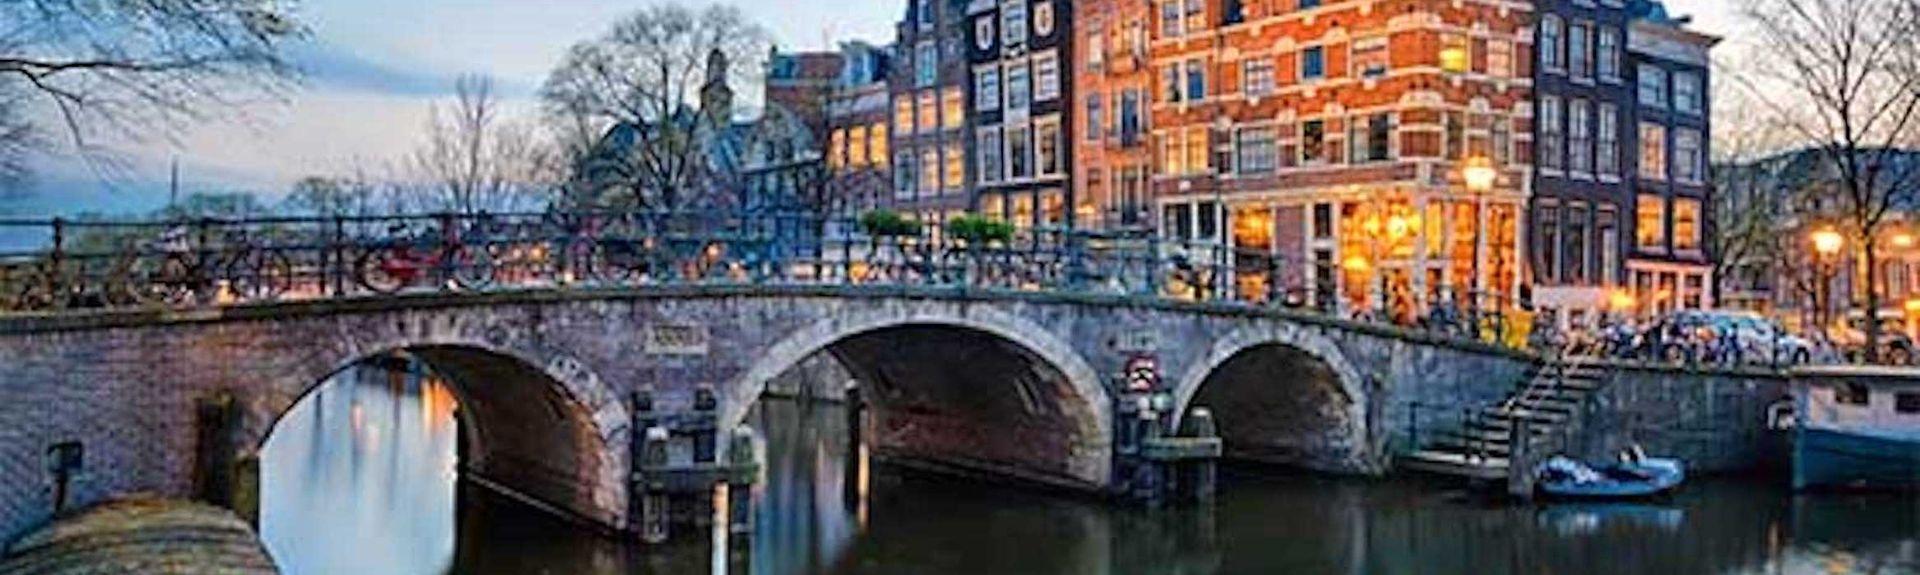 Amsterdam-West, Amsterdam, Netherlands